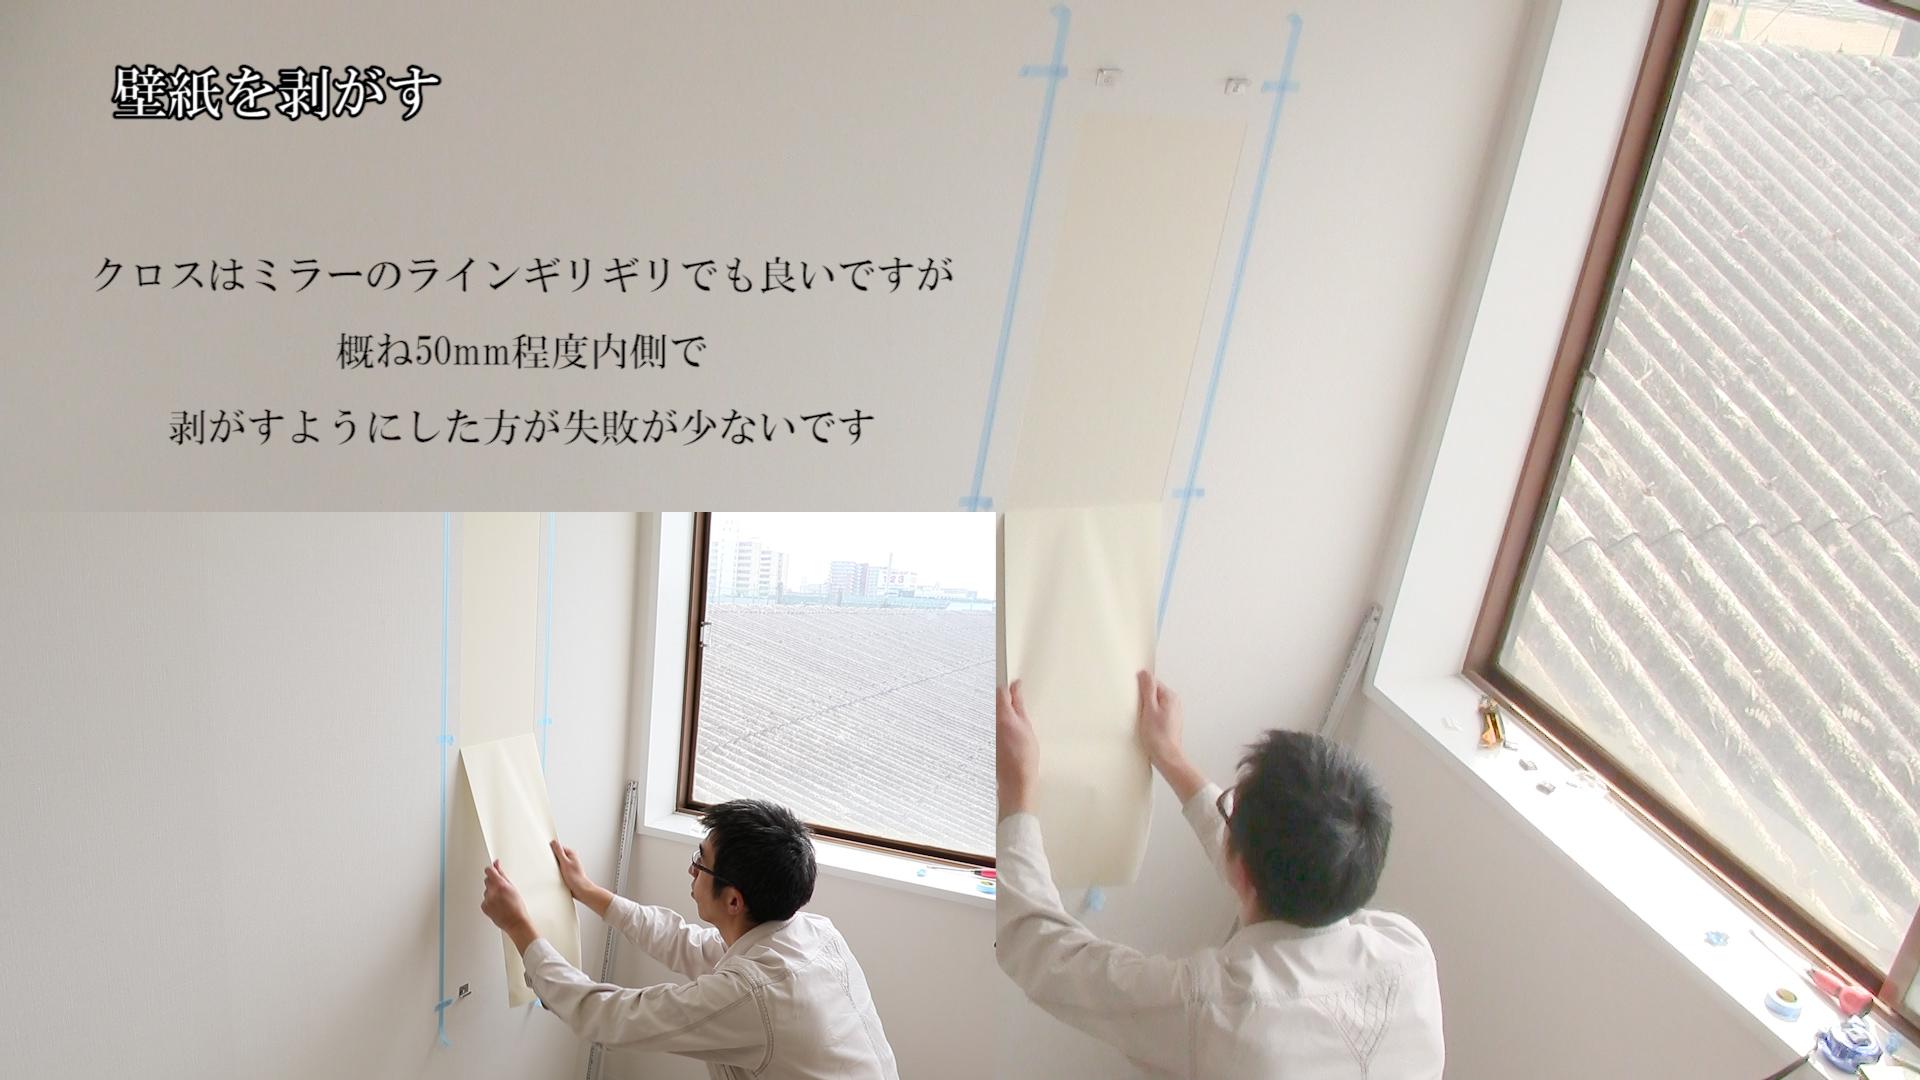 Diyシリーズ ハンガー金具を使って壁にミラーを取り付ける方法 Kg